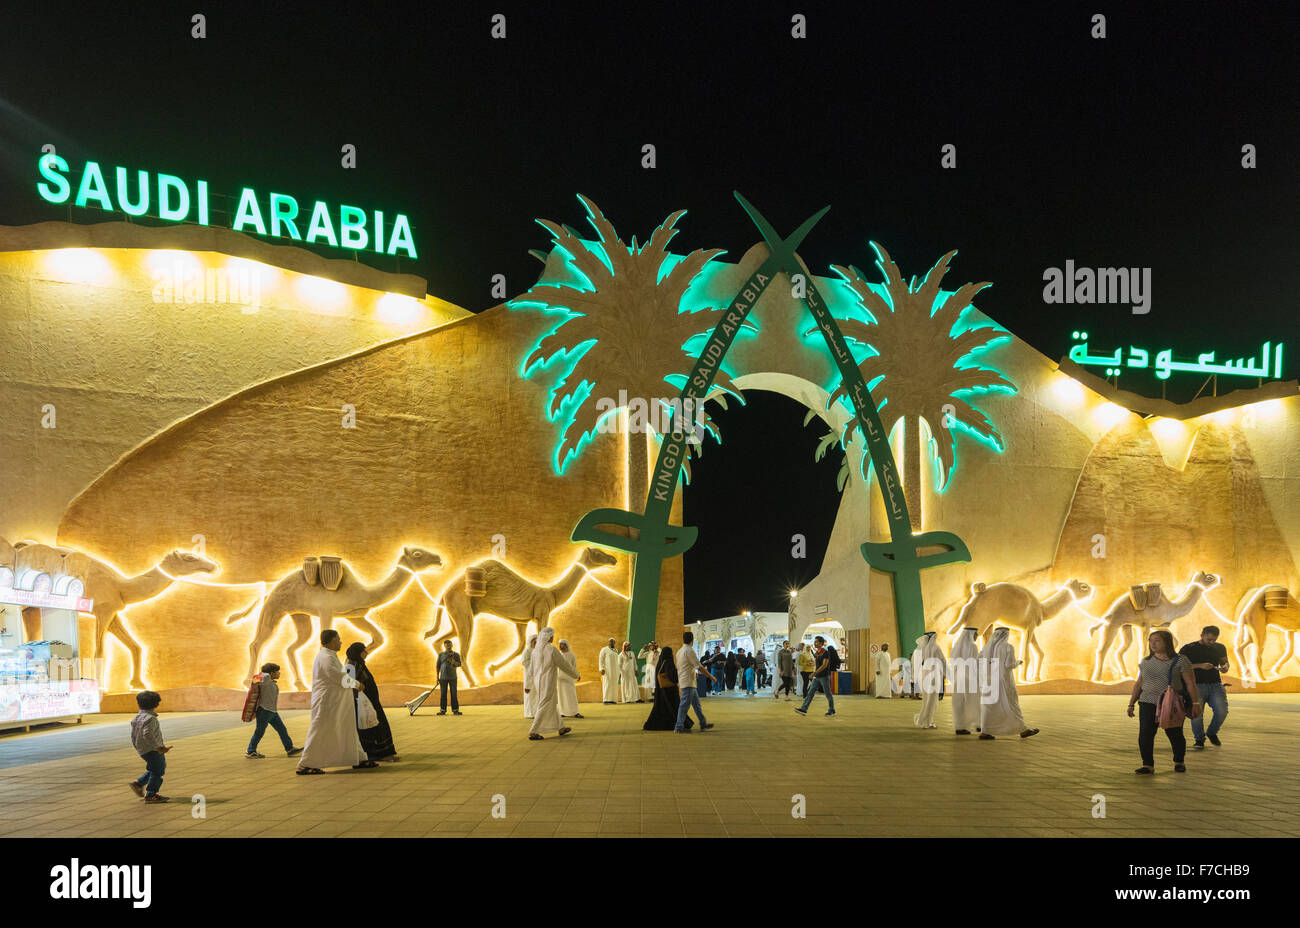 Illuminated Saudi Arabia pavilion at night at Global Village 2015 in Dubai United Arab Emirates - Stock Image